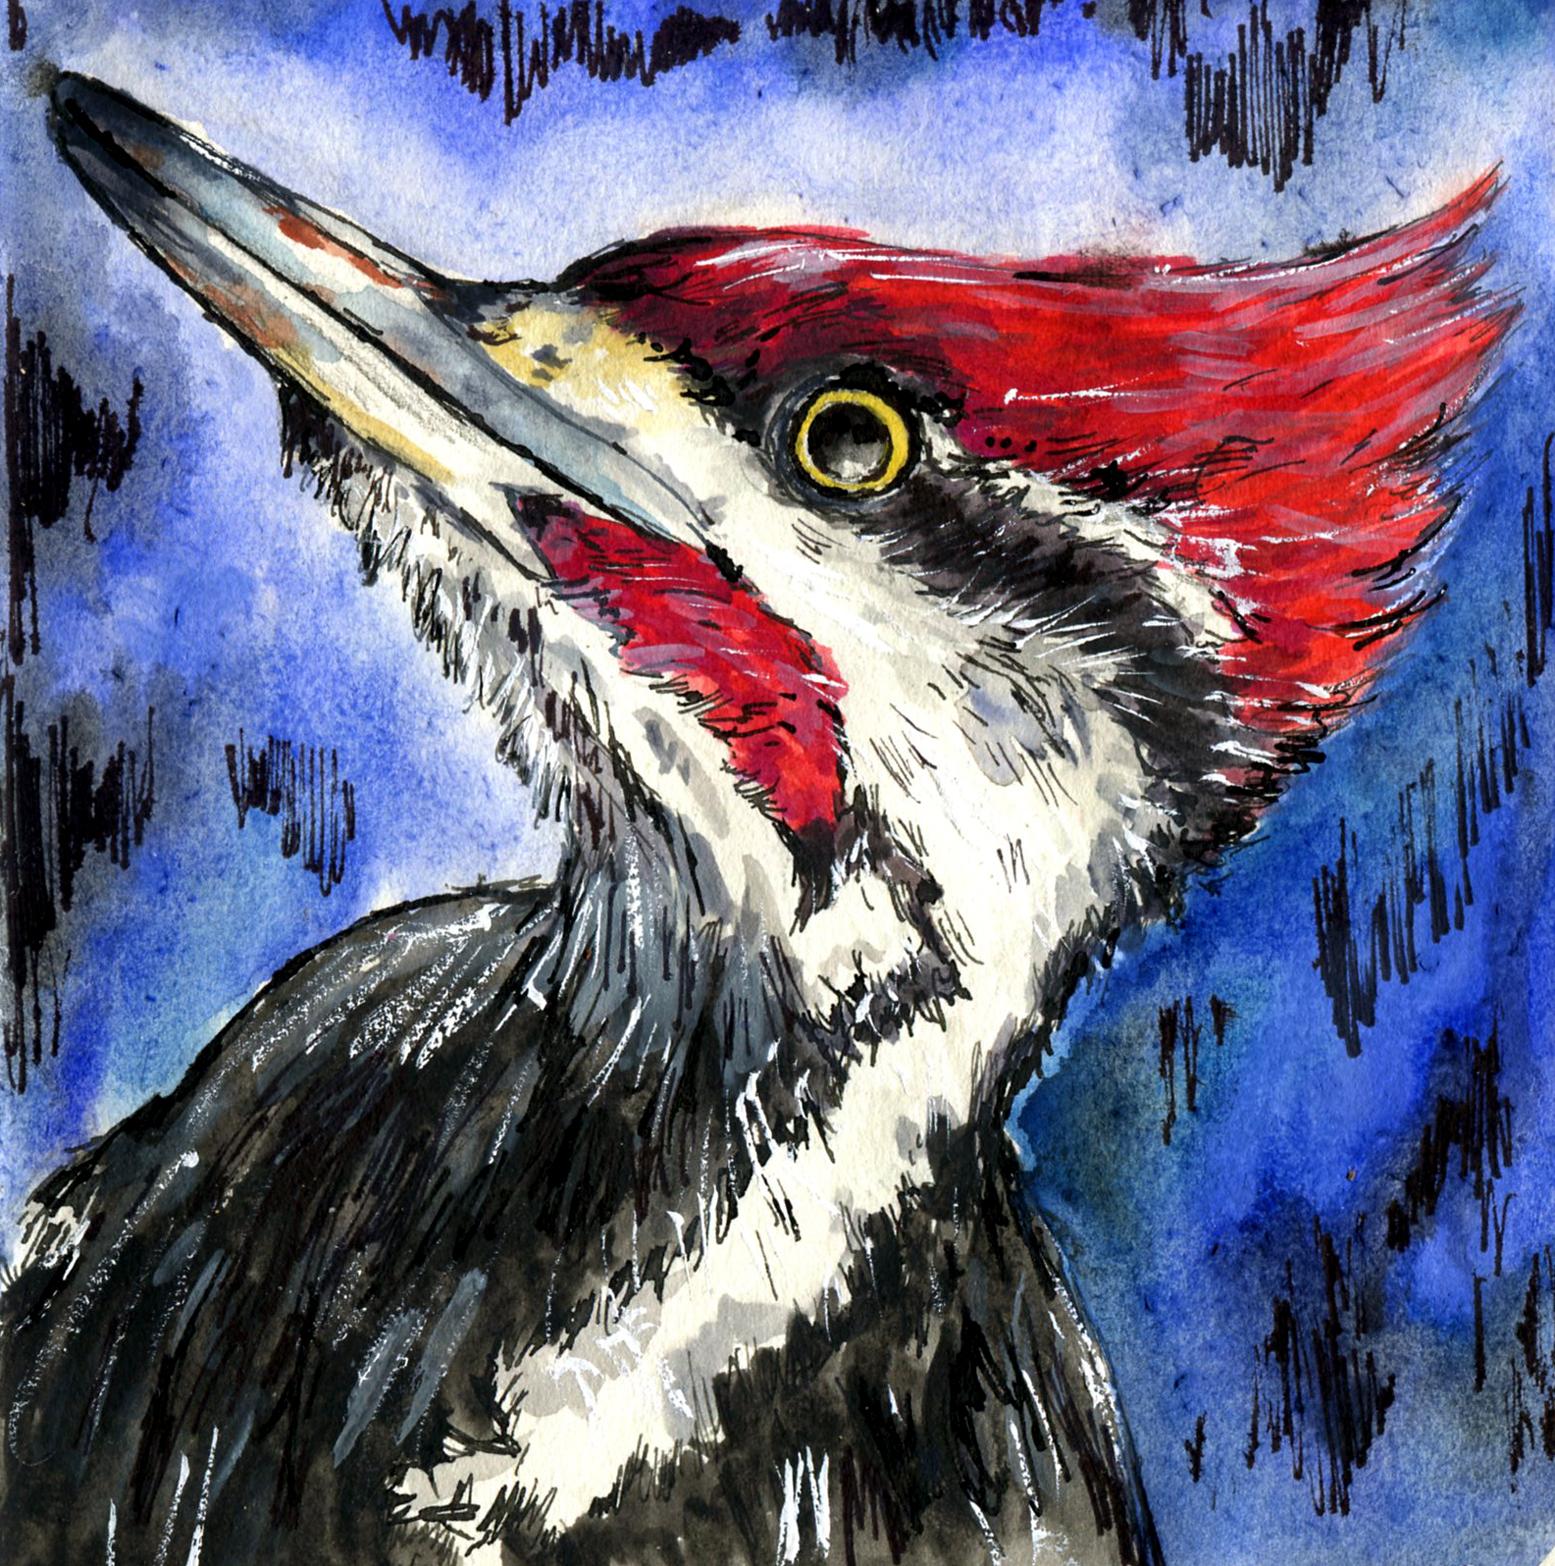 78. Pileated Woodpecker